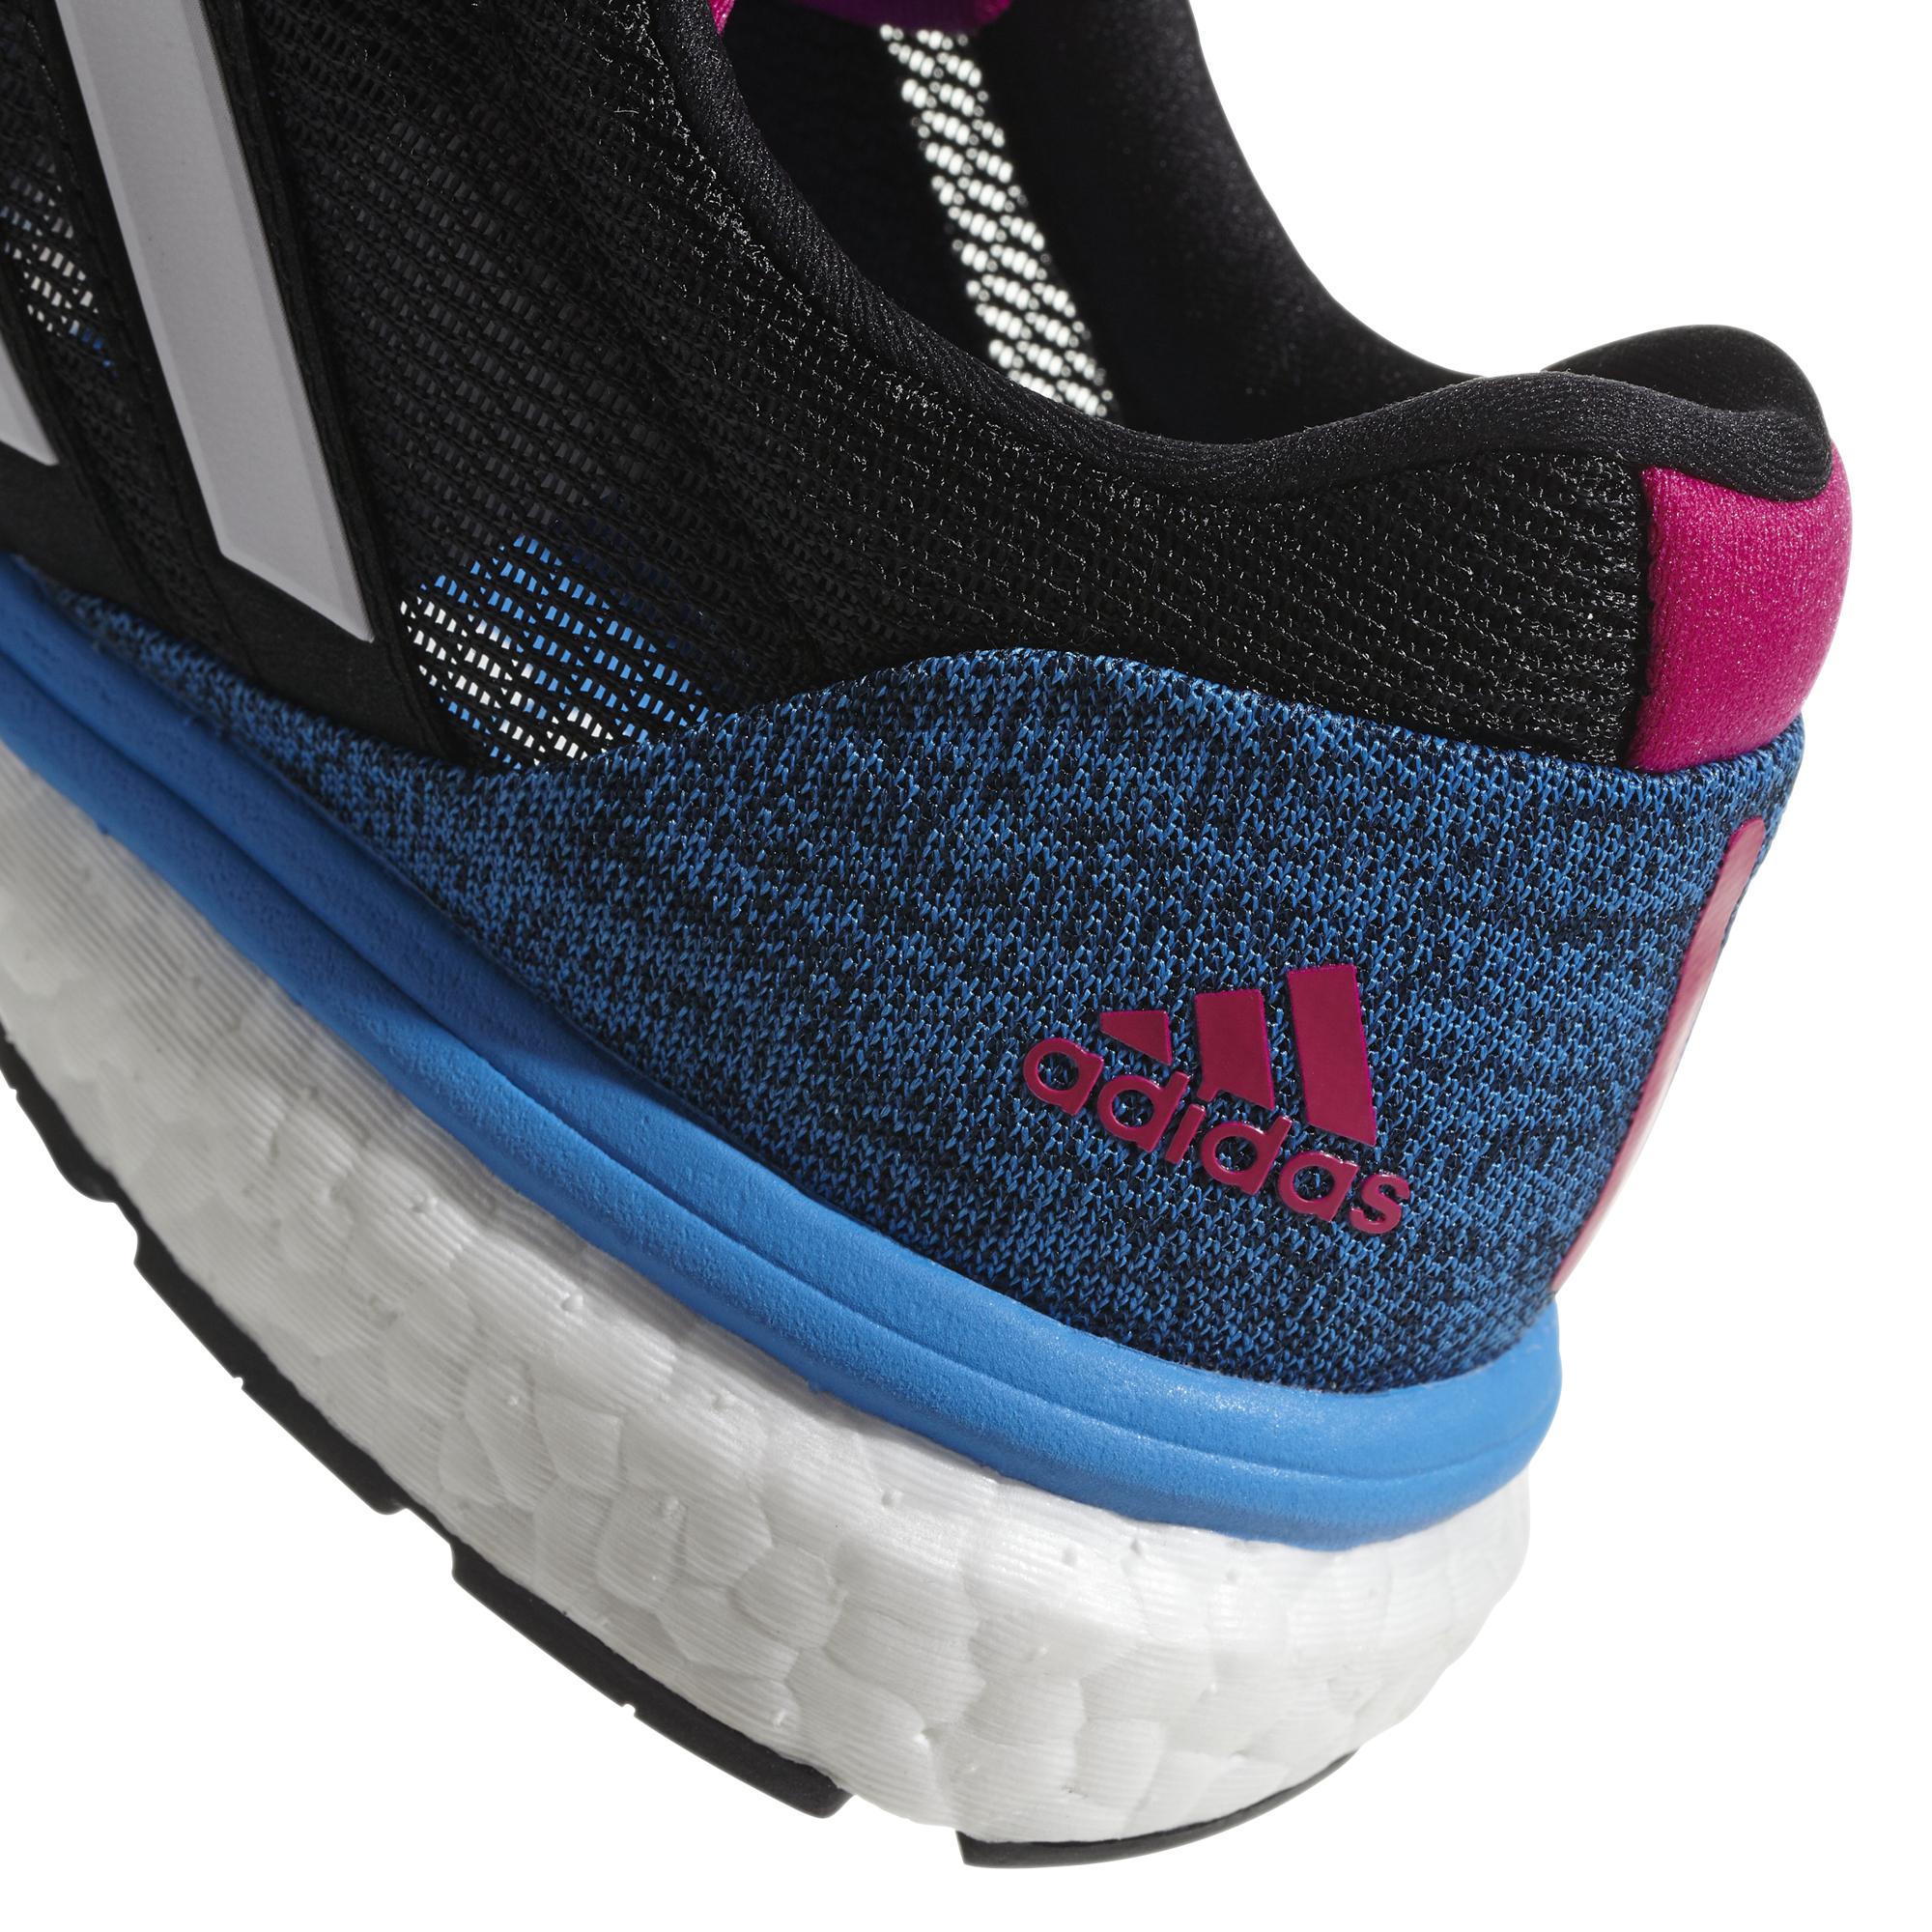 Adidas (Yeezy 350 V2) (Blue Water) joggesko